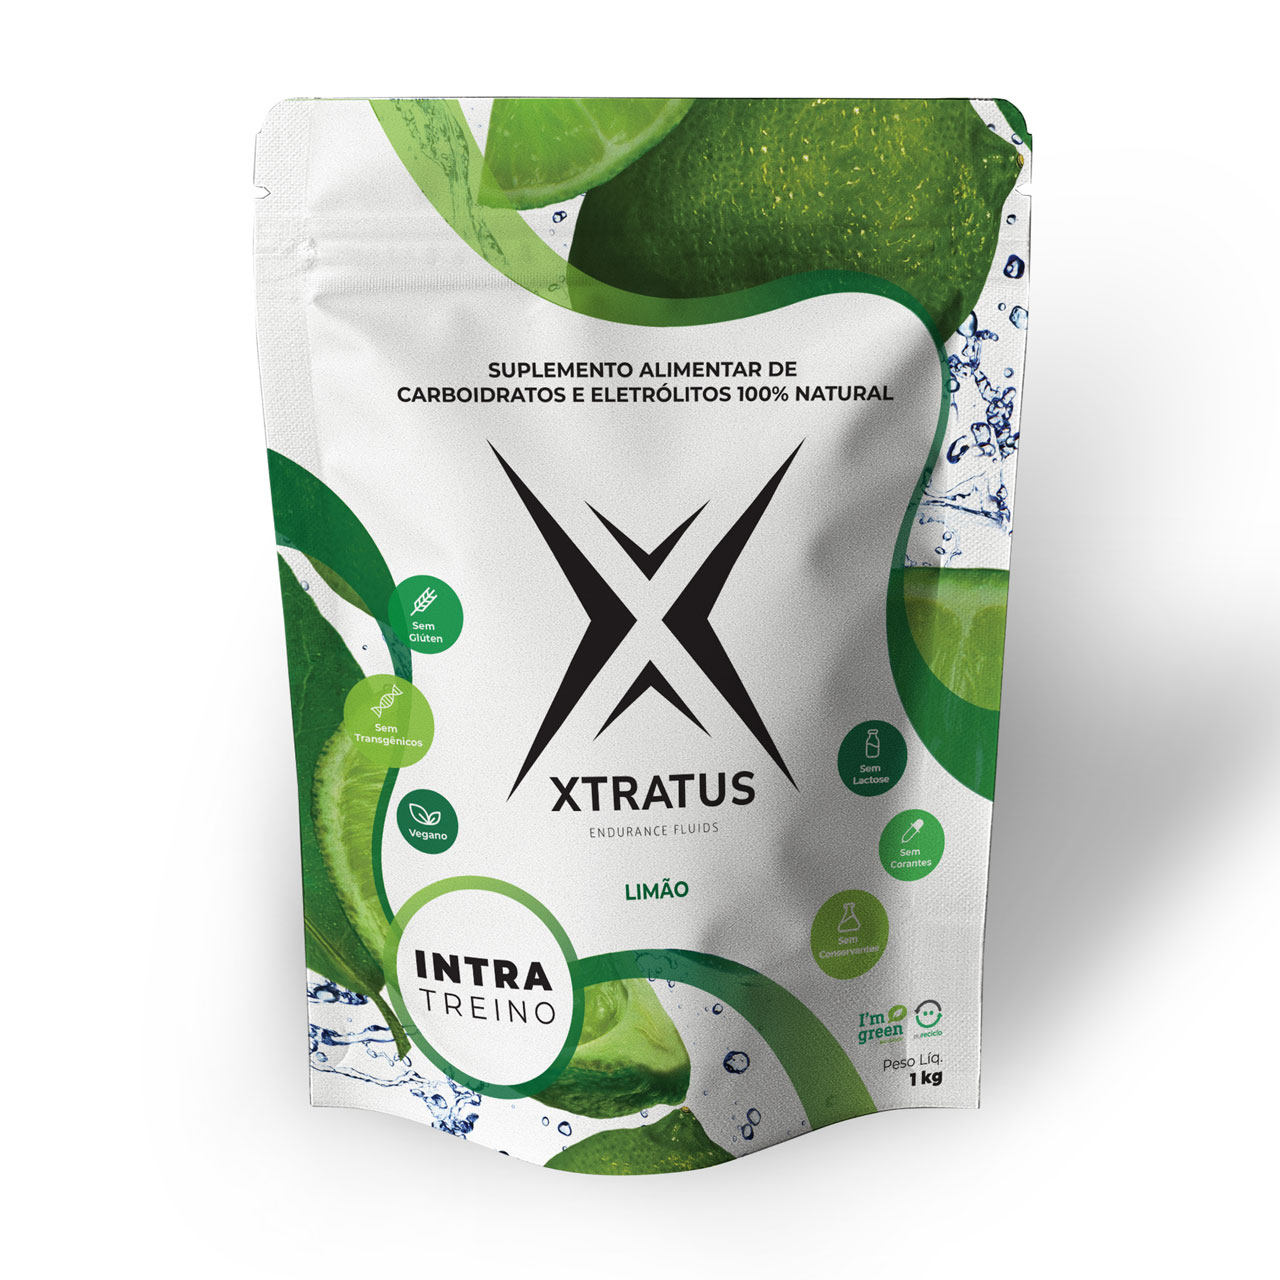 XTratus Endurance Fluid Limão 1Kg  - KFit Nutrition